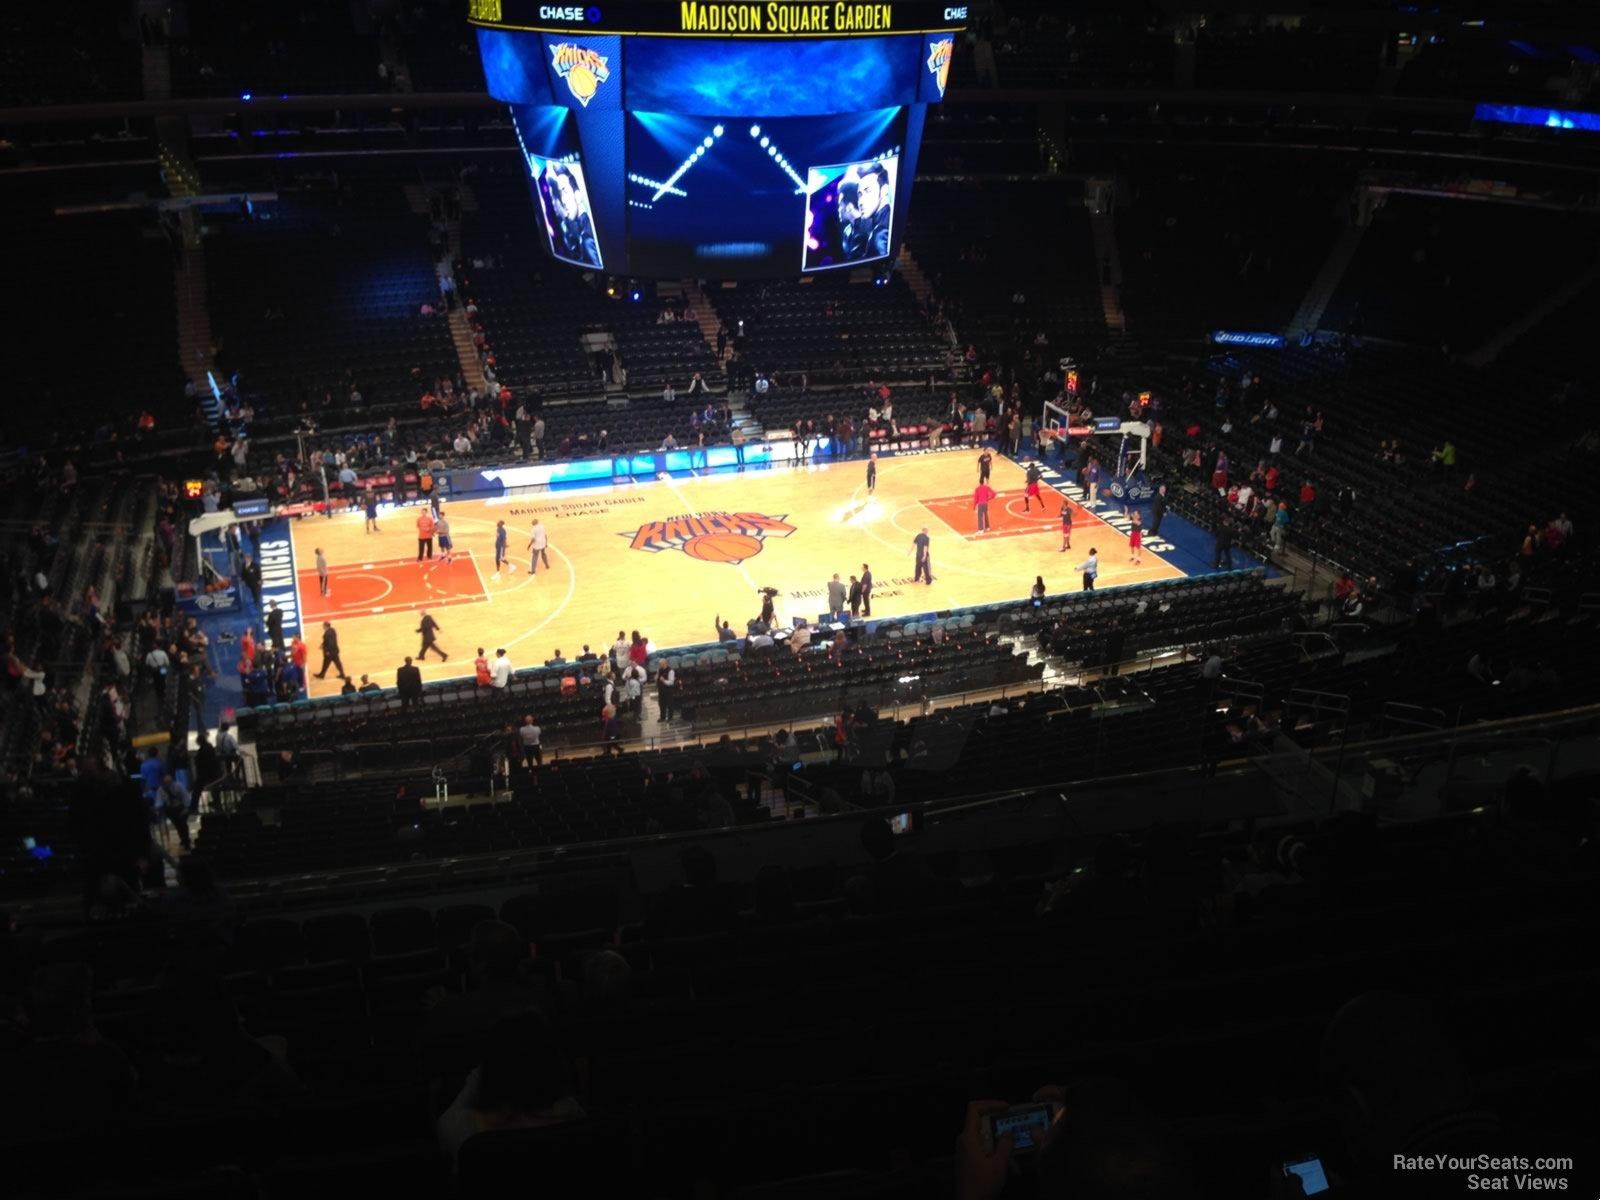 Madison Square Garden: Madison Square Garden Basketball